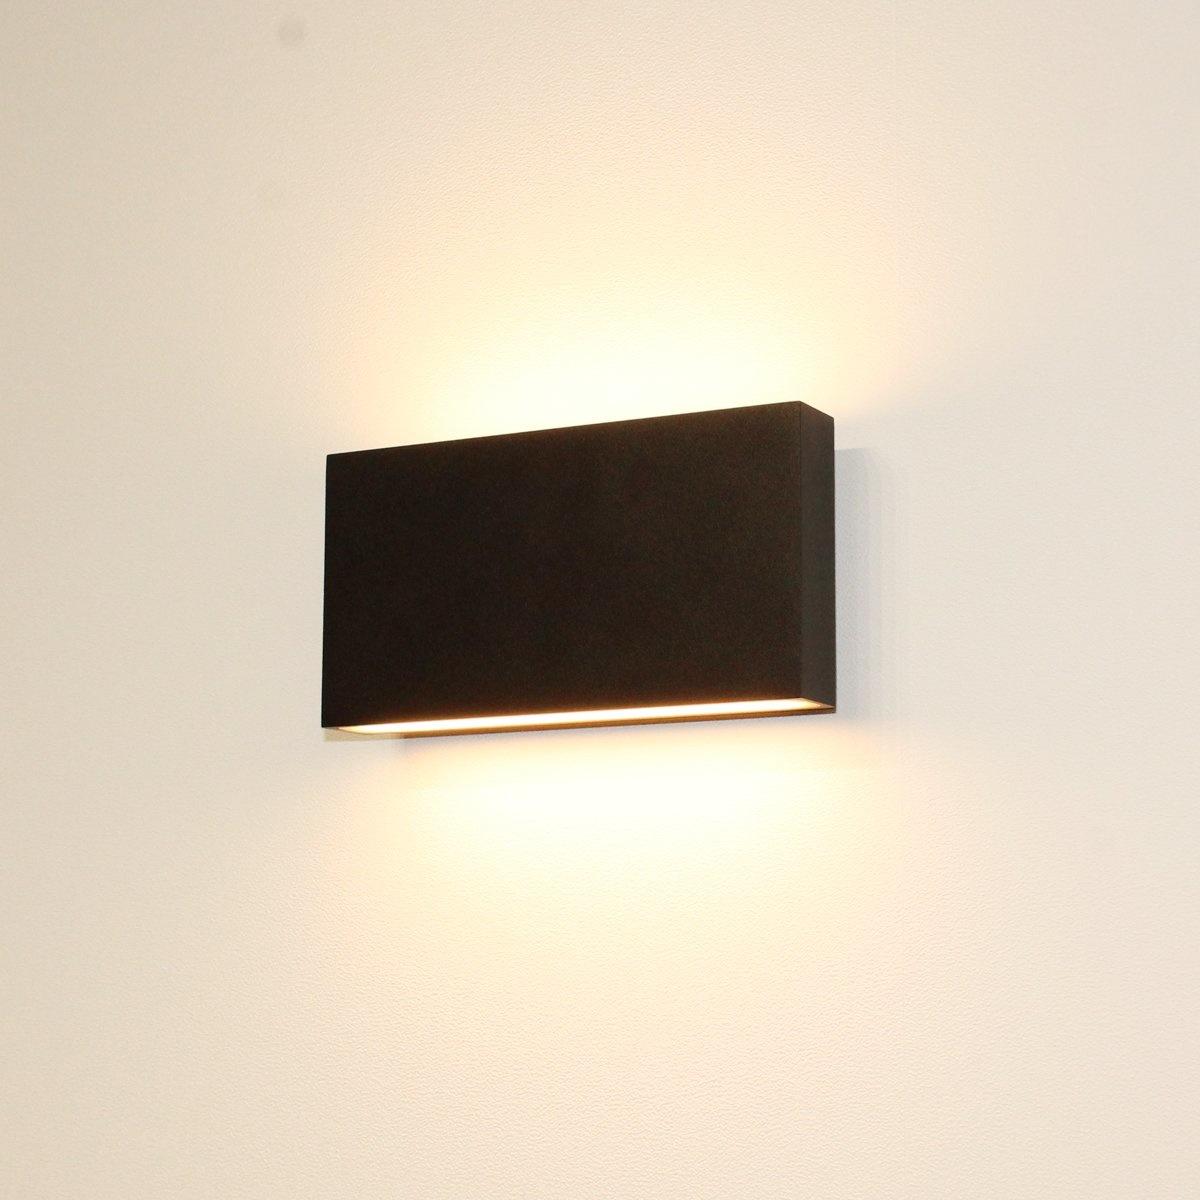 Artdelight Wandlamp Box L 17 cm H 9 cm zwart